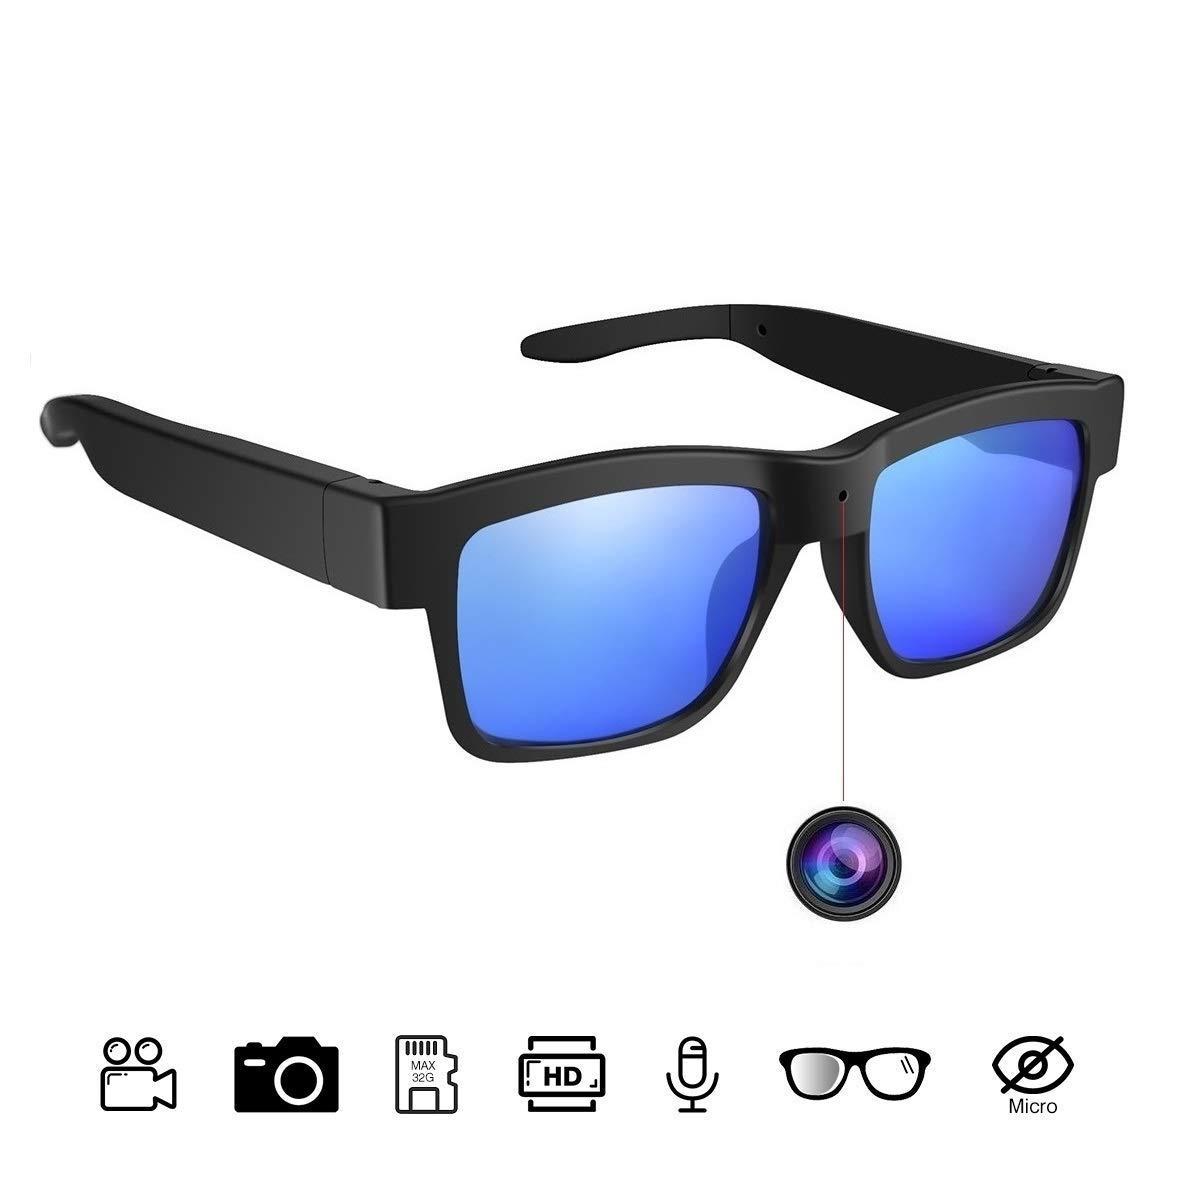 Sunglasses Camera Full HD 1080P, 65 Degree Angle for Outdoor Use,Mini Video Camera with UV Protection Polarized Lens